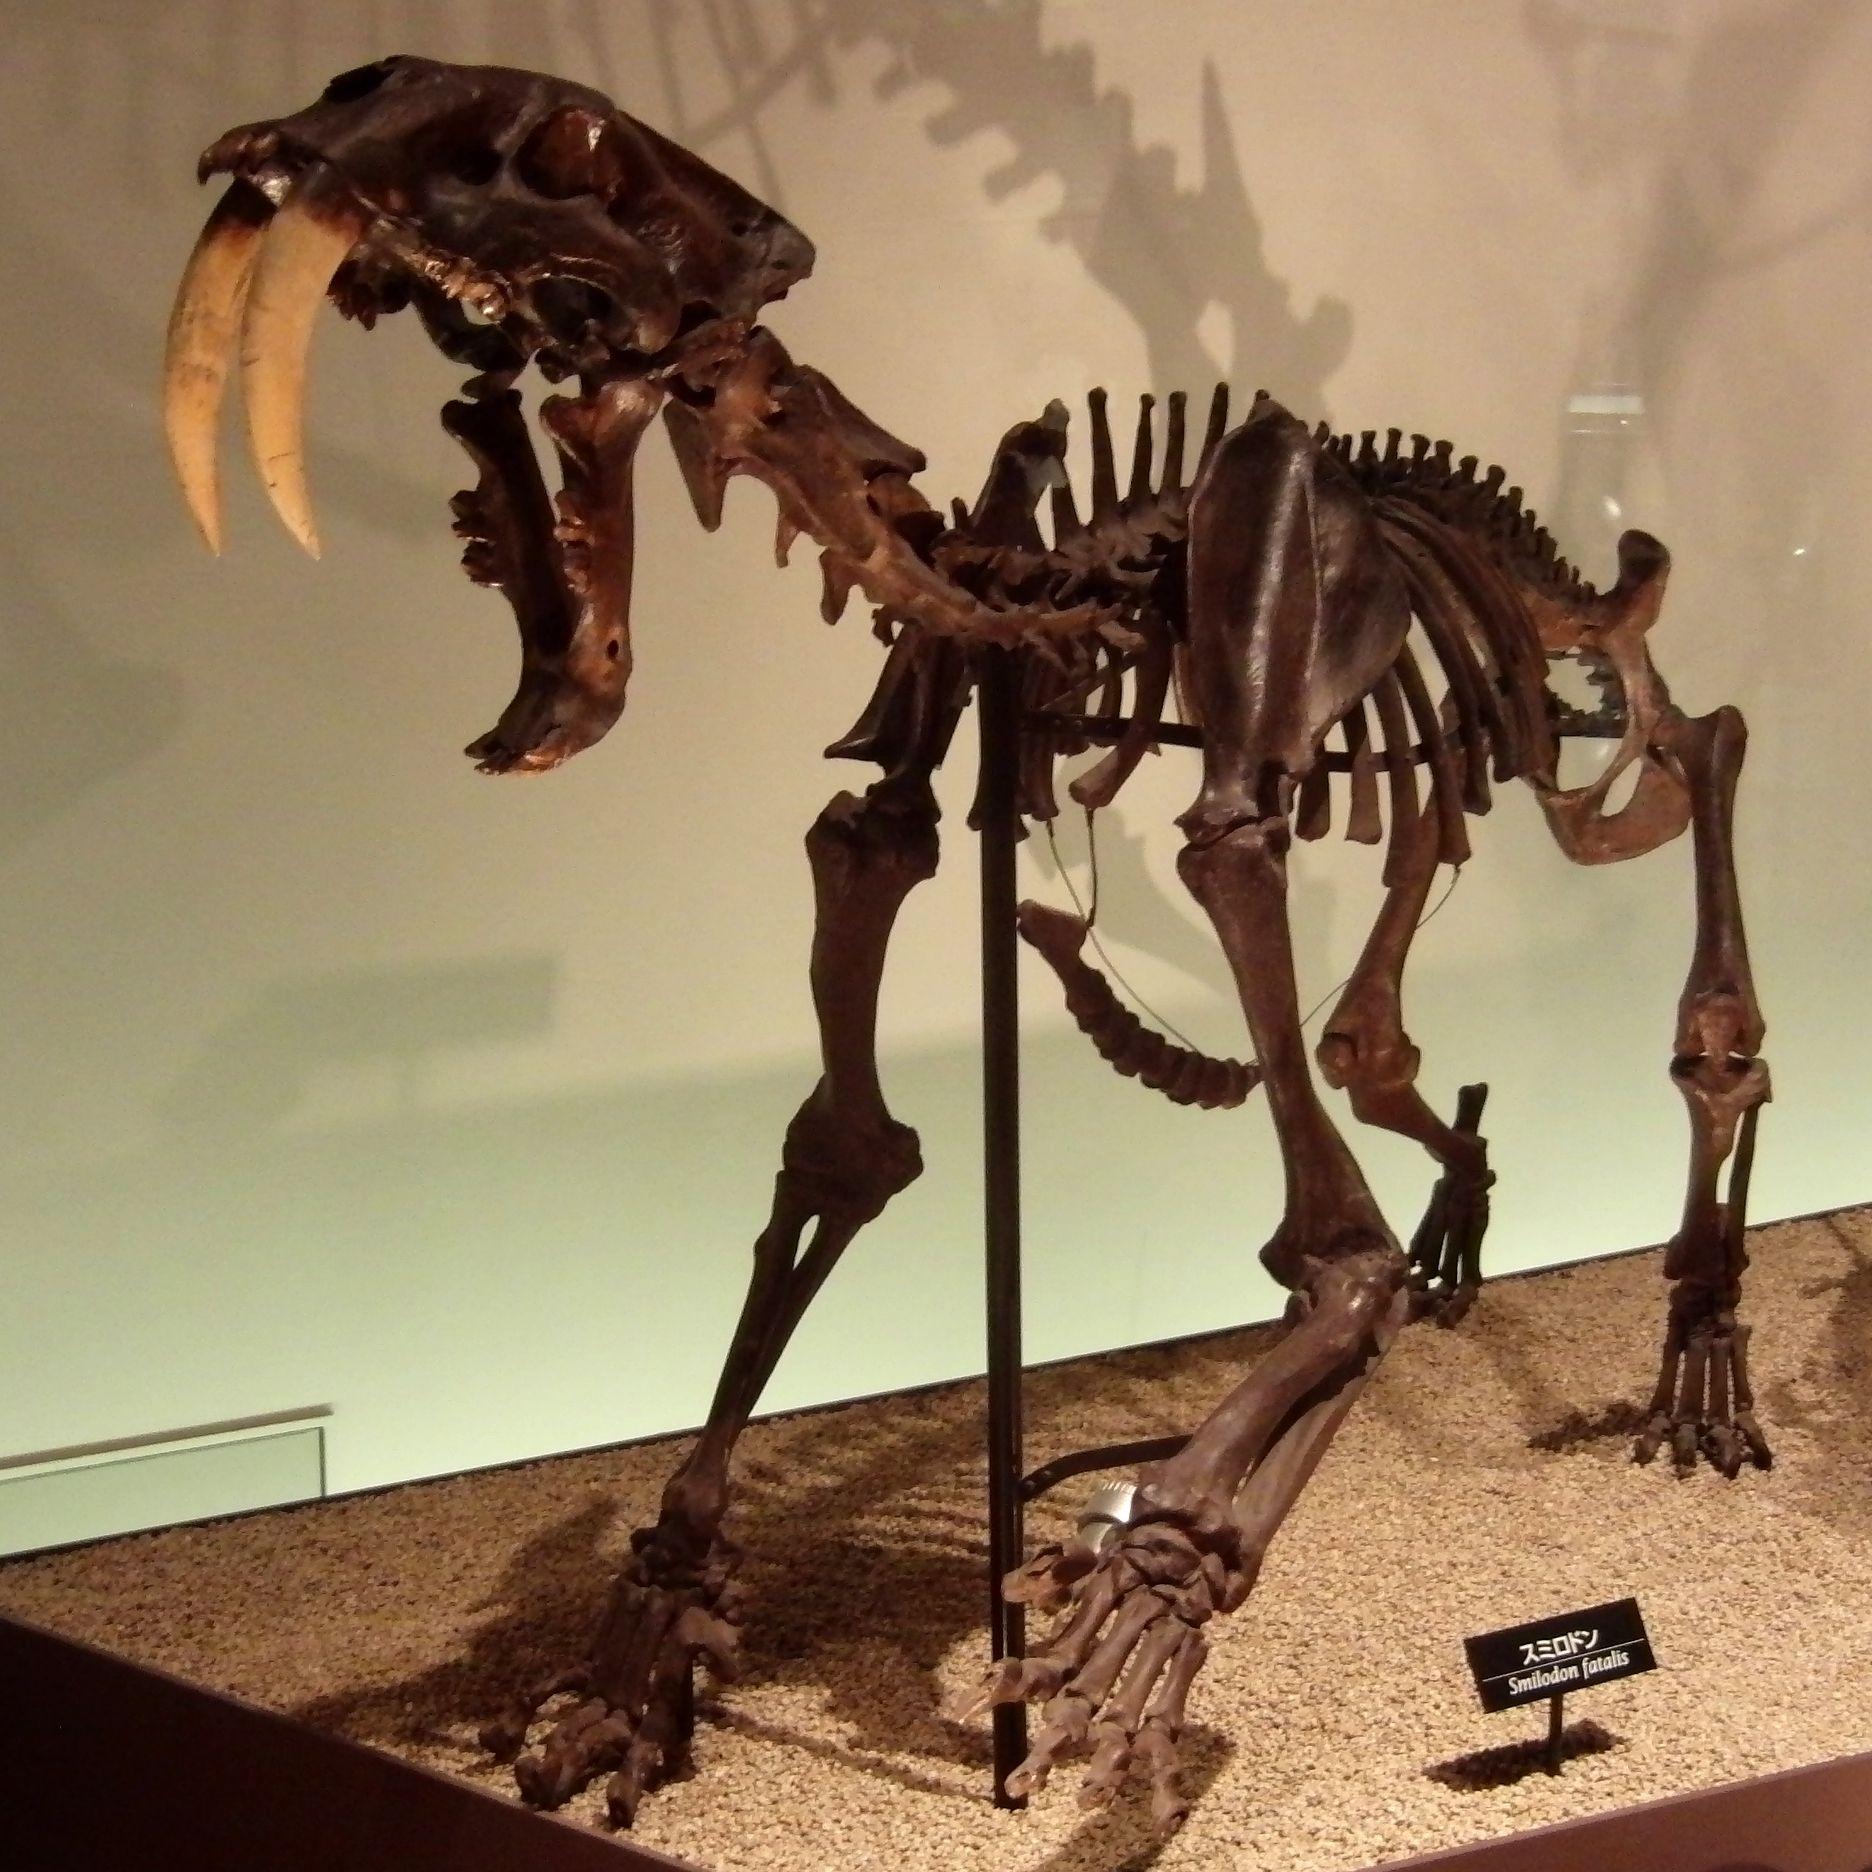 File:Smilodon californicus p1350716.jpg - Wikimedia Commons